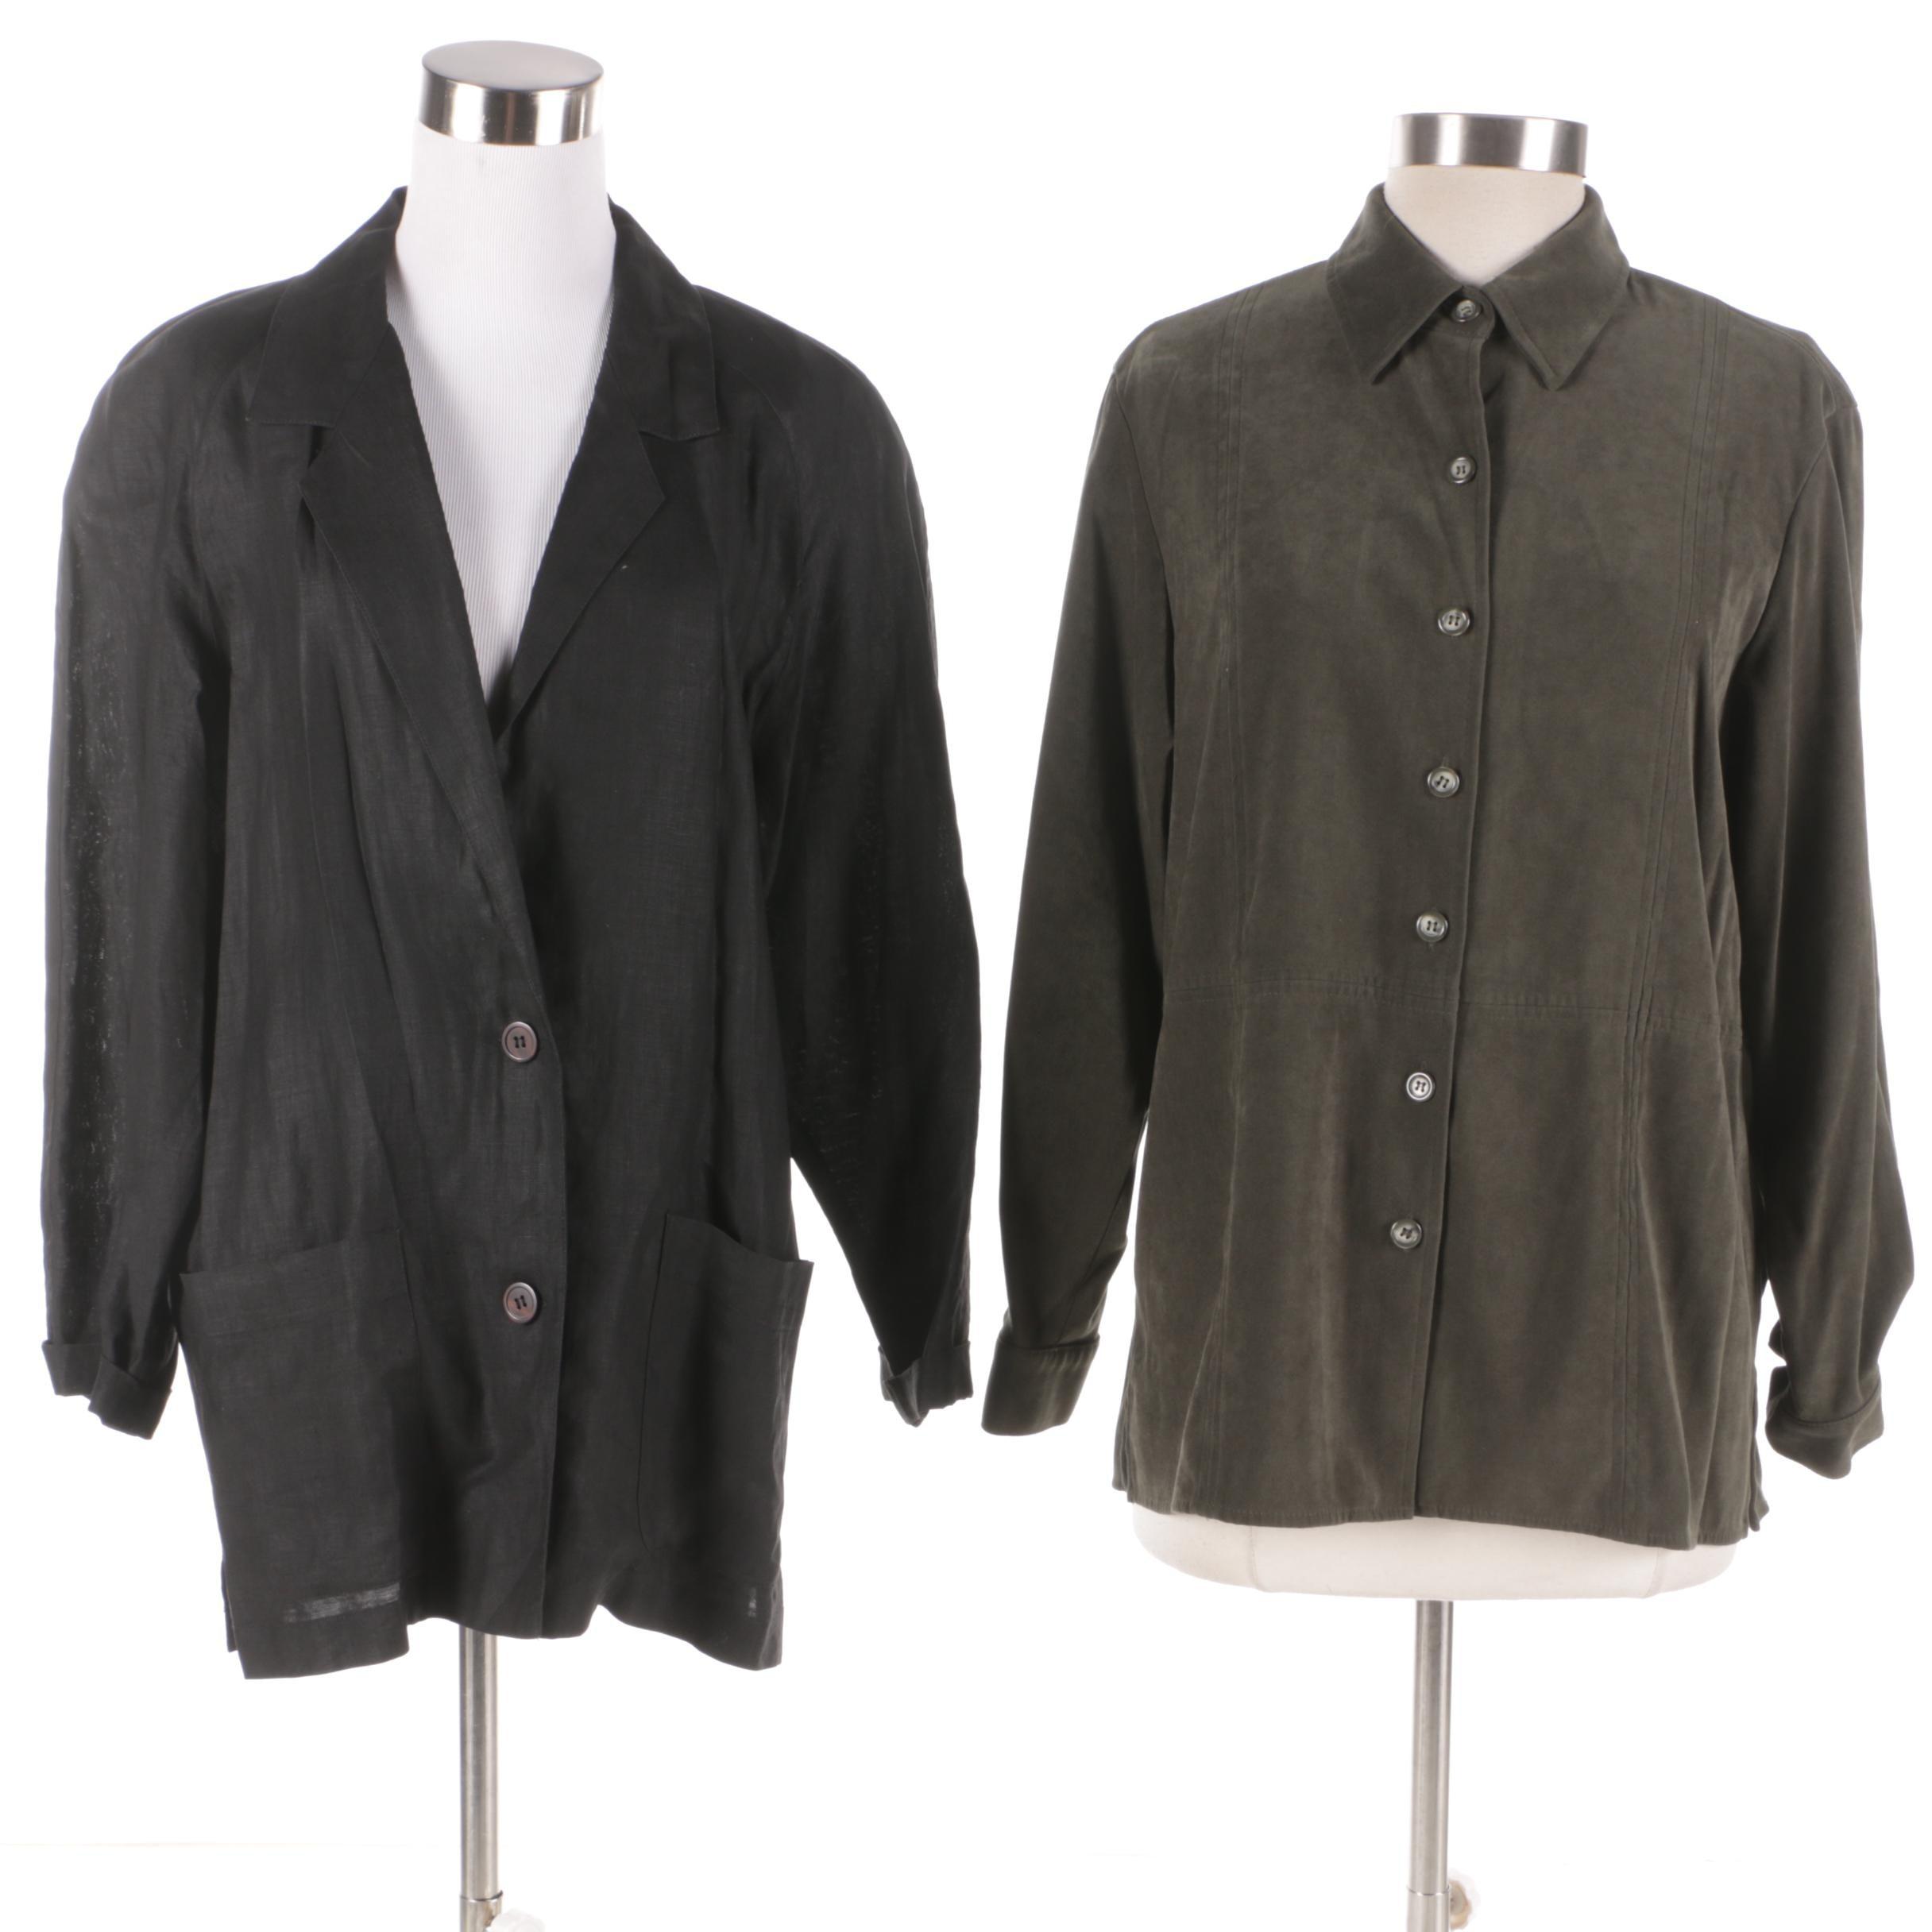 Talbots Shirt and Linen Jacket